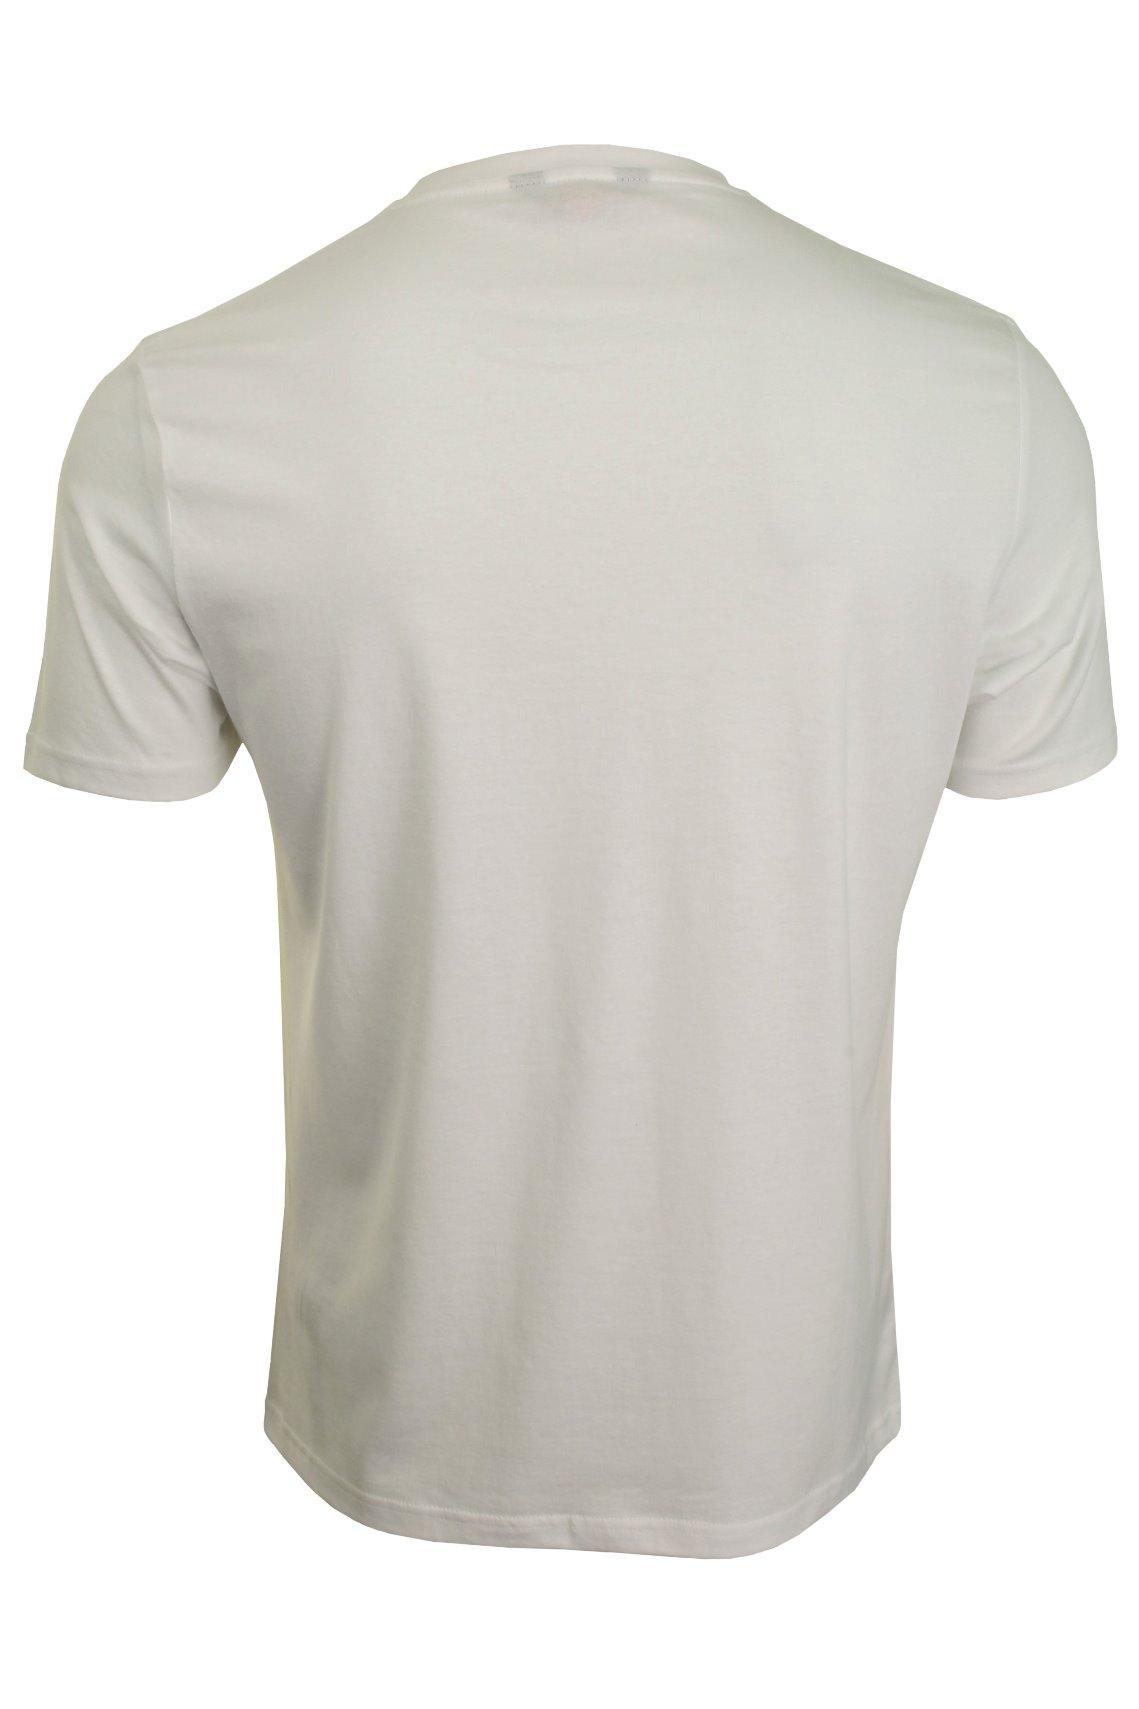 Ben Sherman Men/'s Short Sleeved T-Shirt